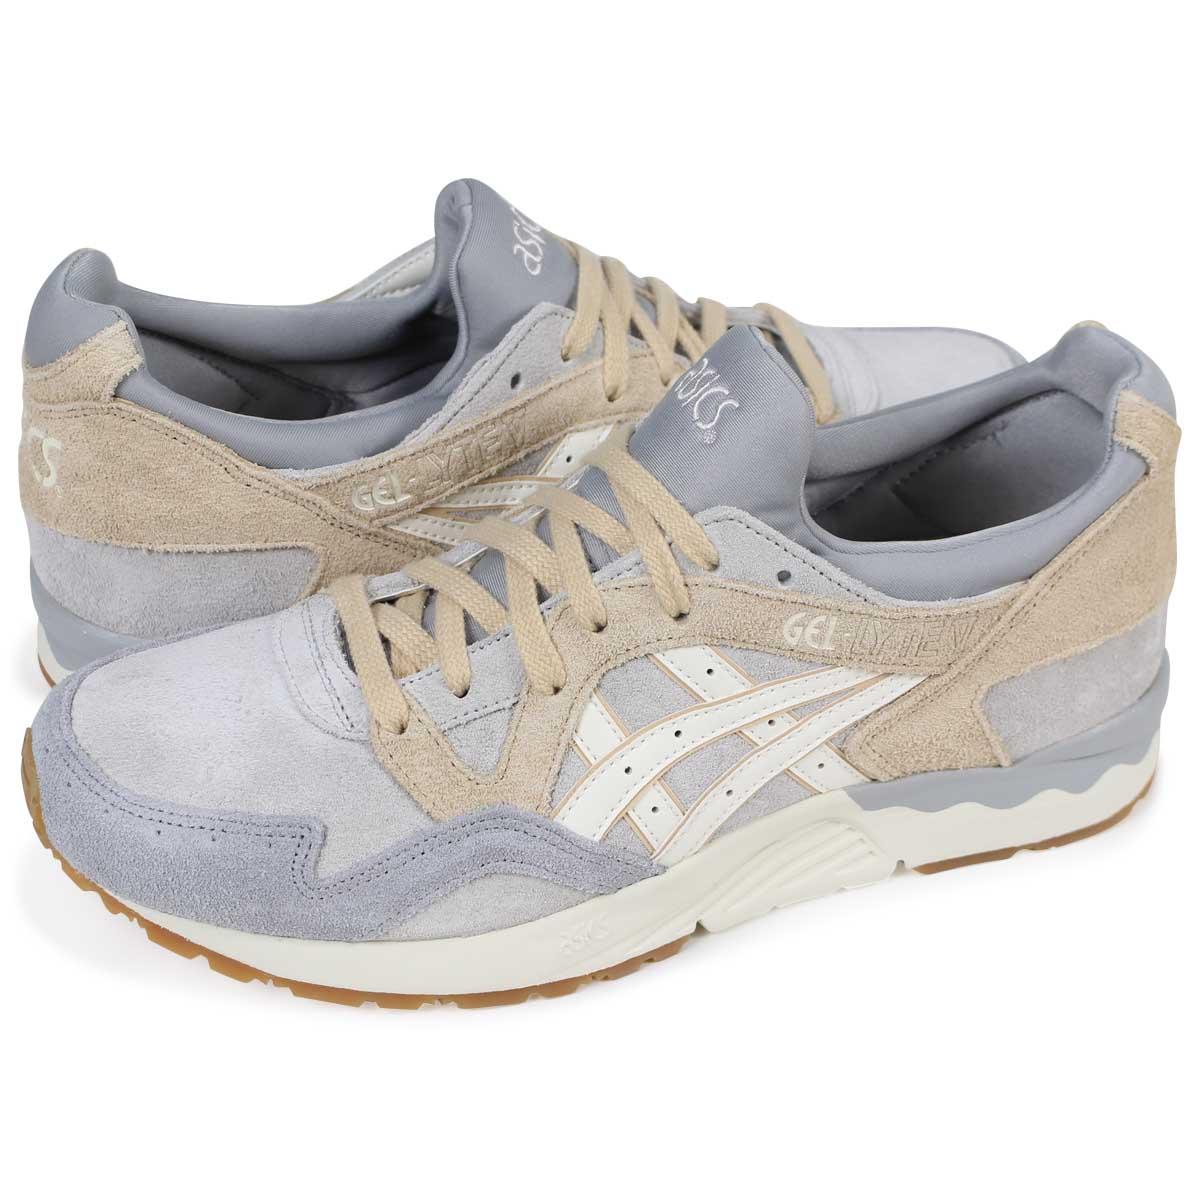 size 40 6f734 31866 asics Tiger GEL-LYTE V ASICS tiger gel light sneakers H833L-9600 men gray  [182]